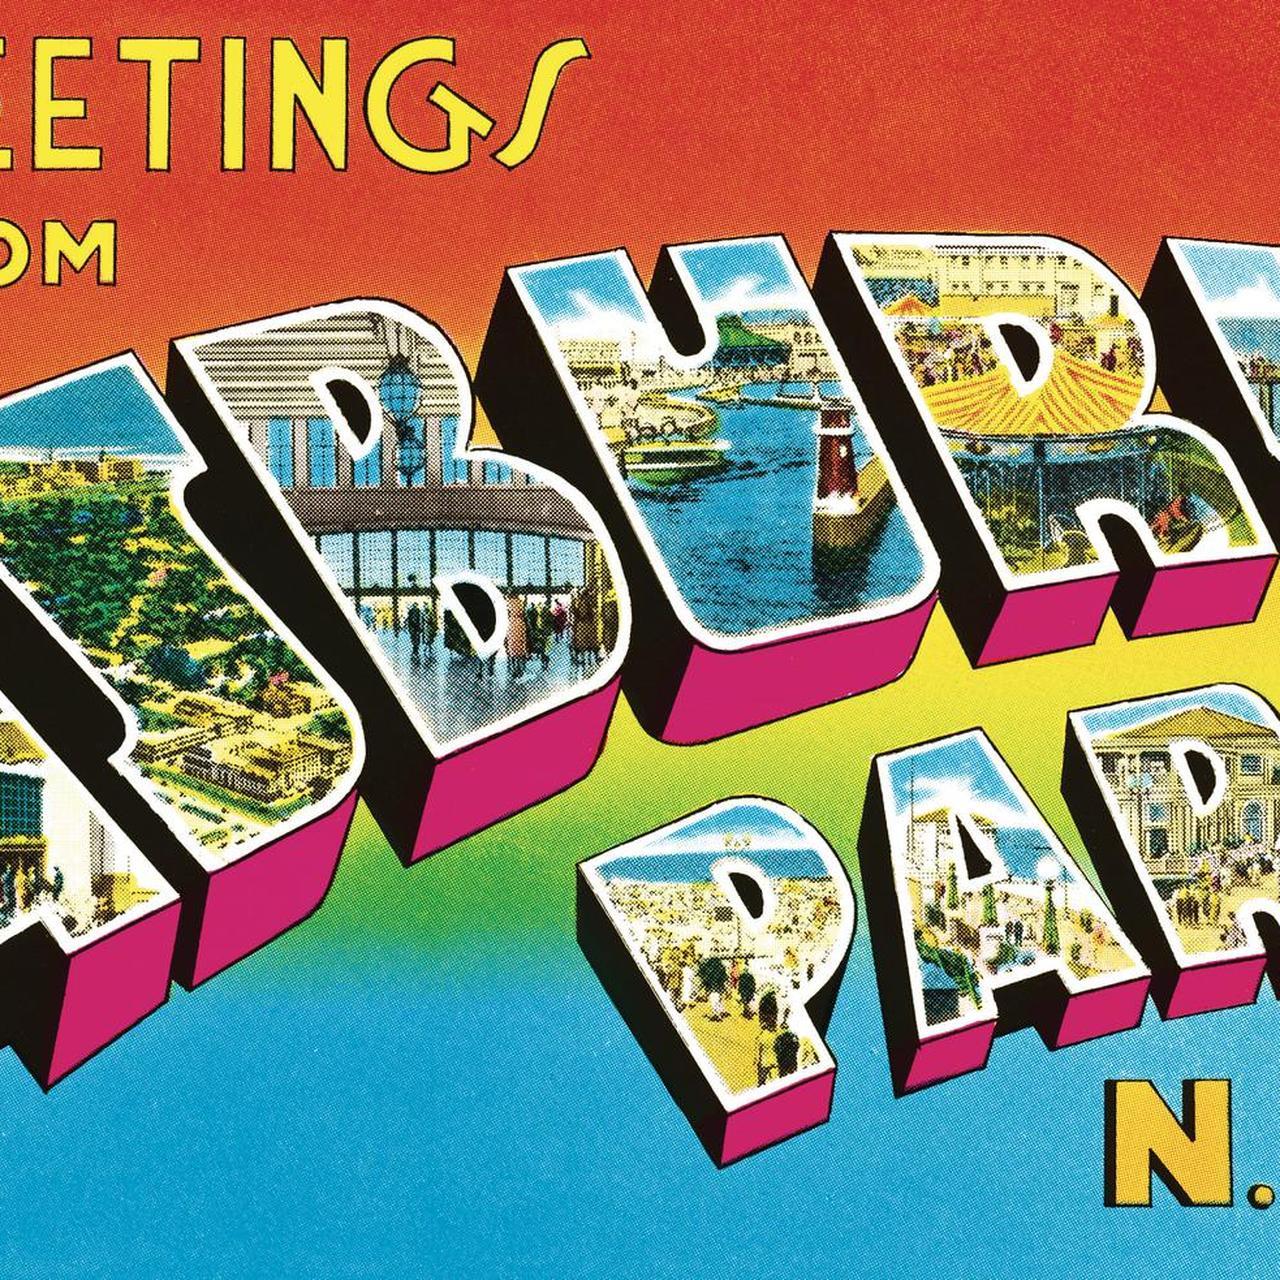 Bruce springsteen greetings from asbury park nj vinyl record bruce springsteen greetings from asbury park nj vinyl record hover to zoom m4hsunfo Gallery